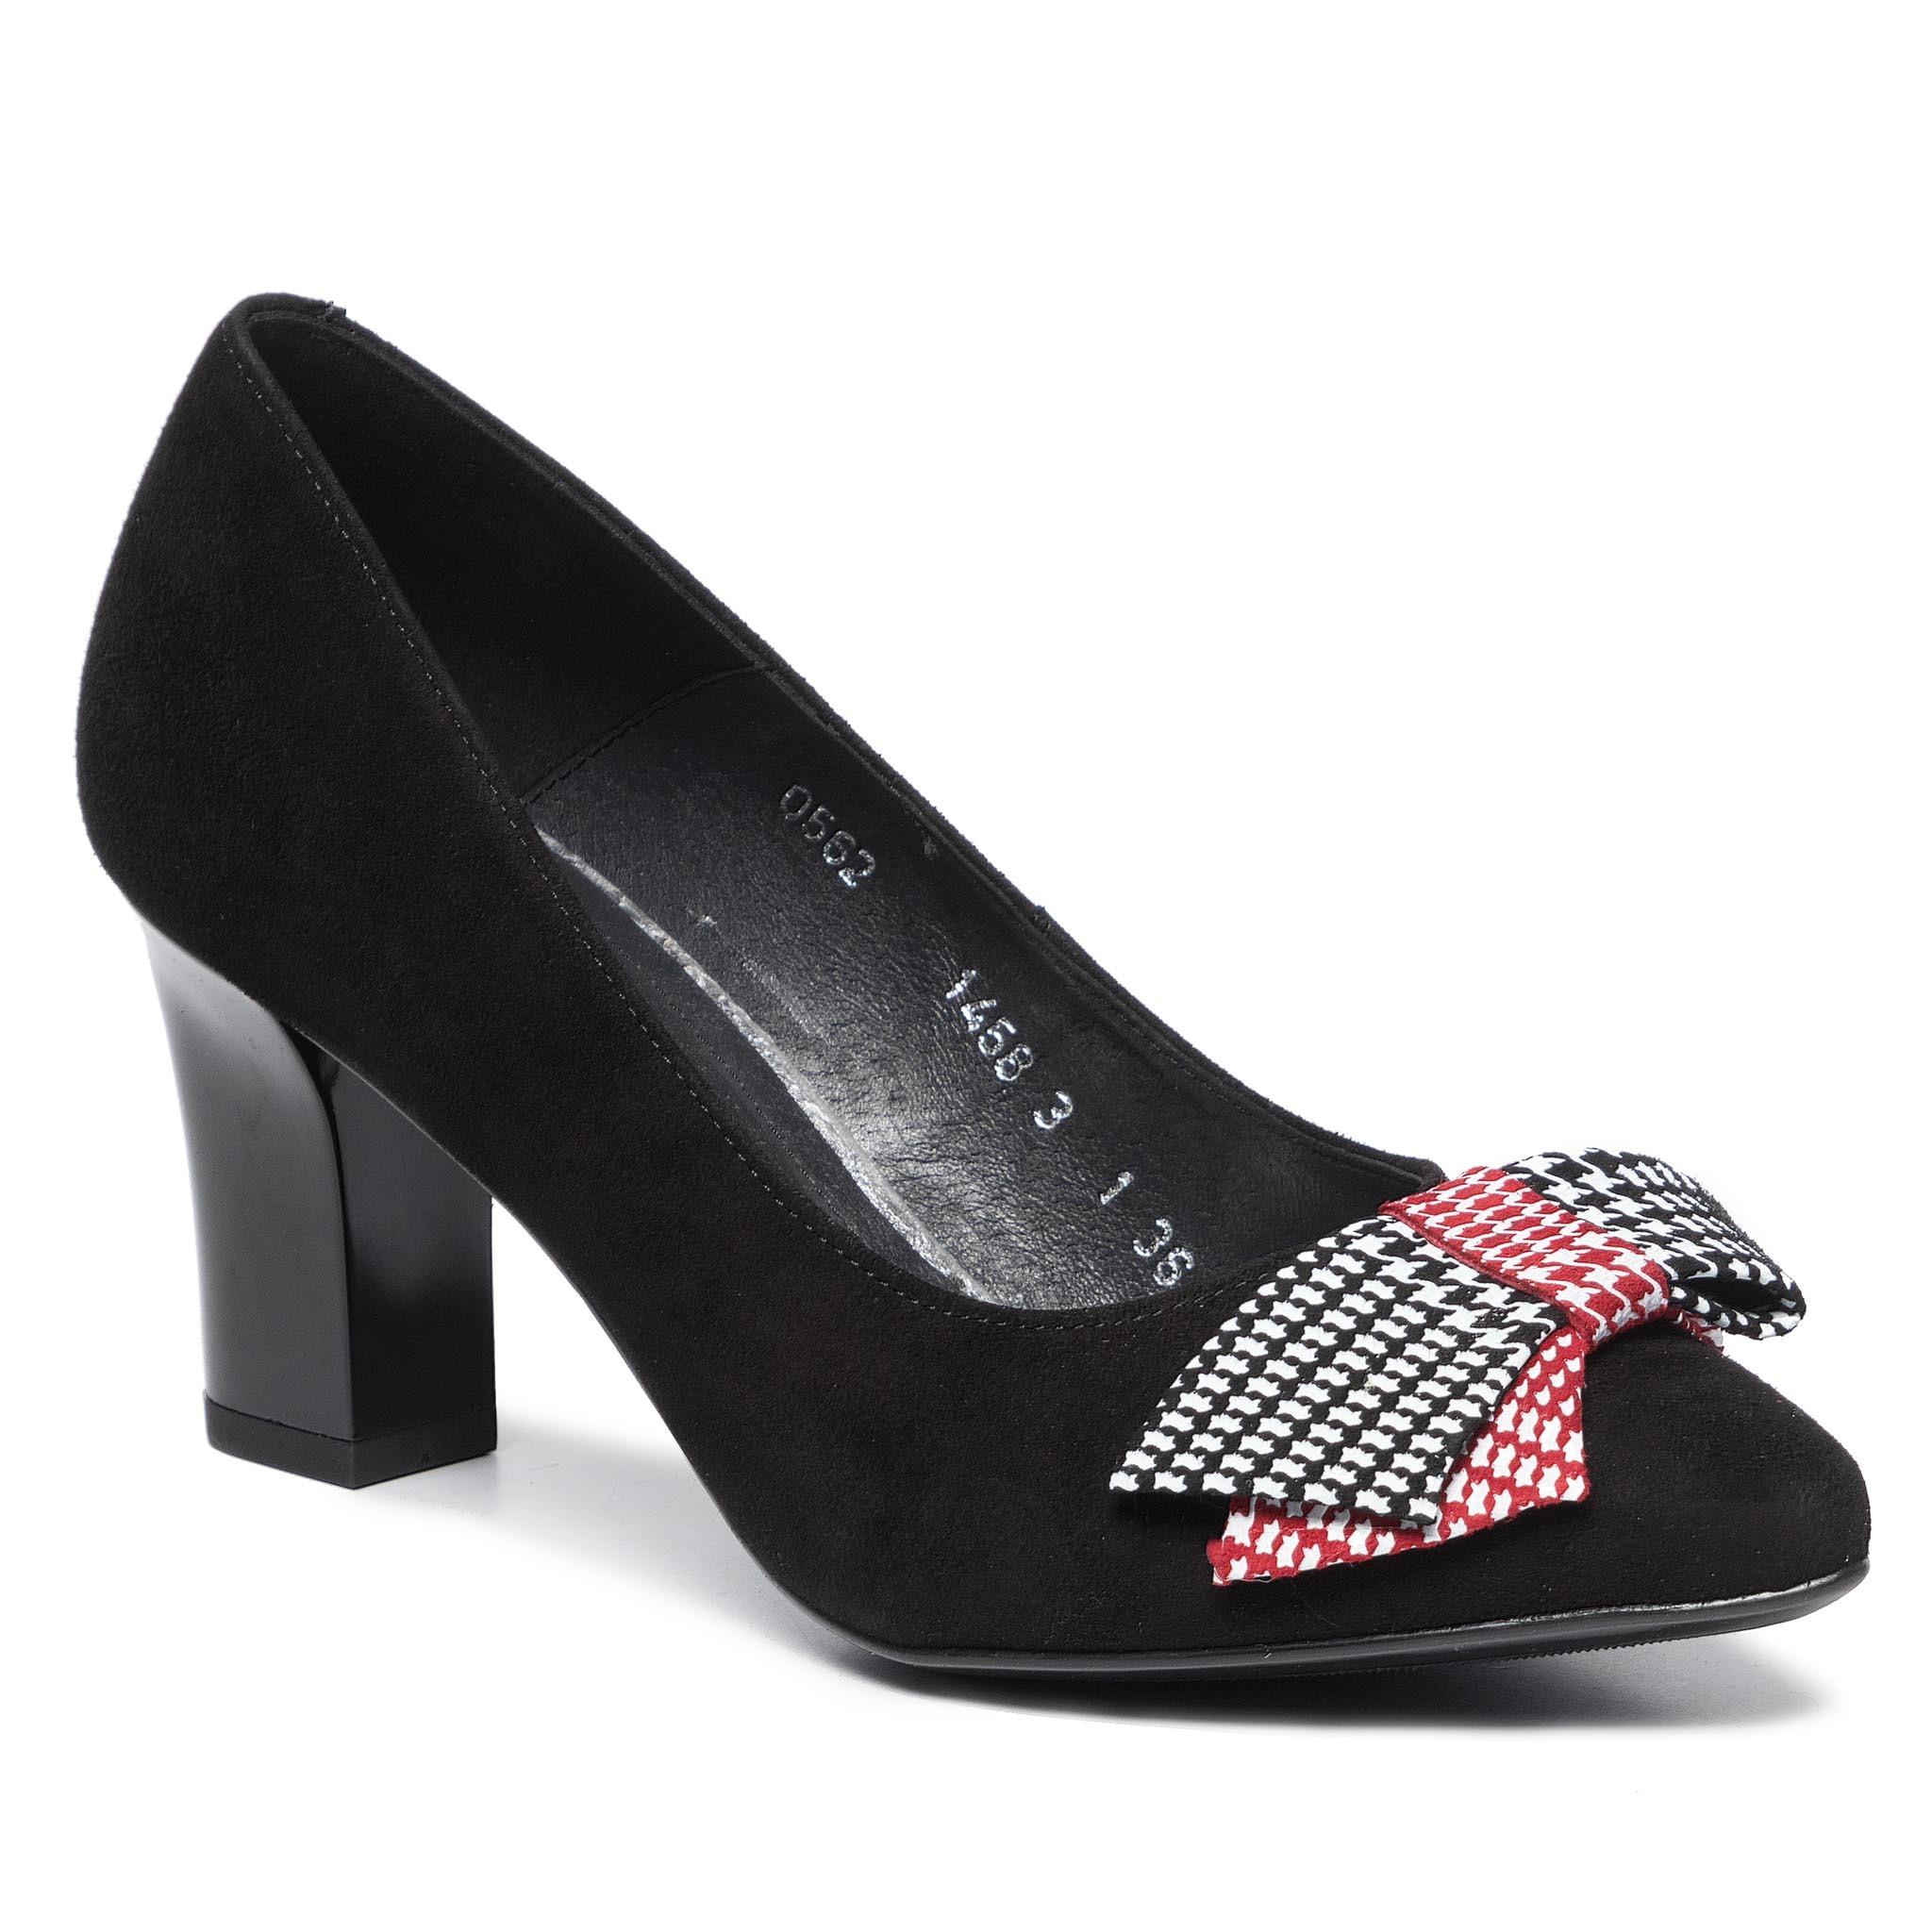 Pantofi ANN MEX - 0562 01W+14KR+01KR Negru